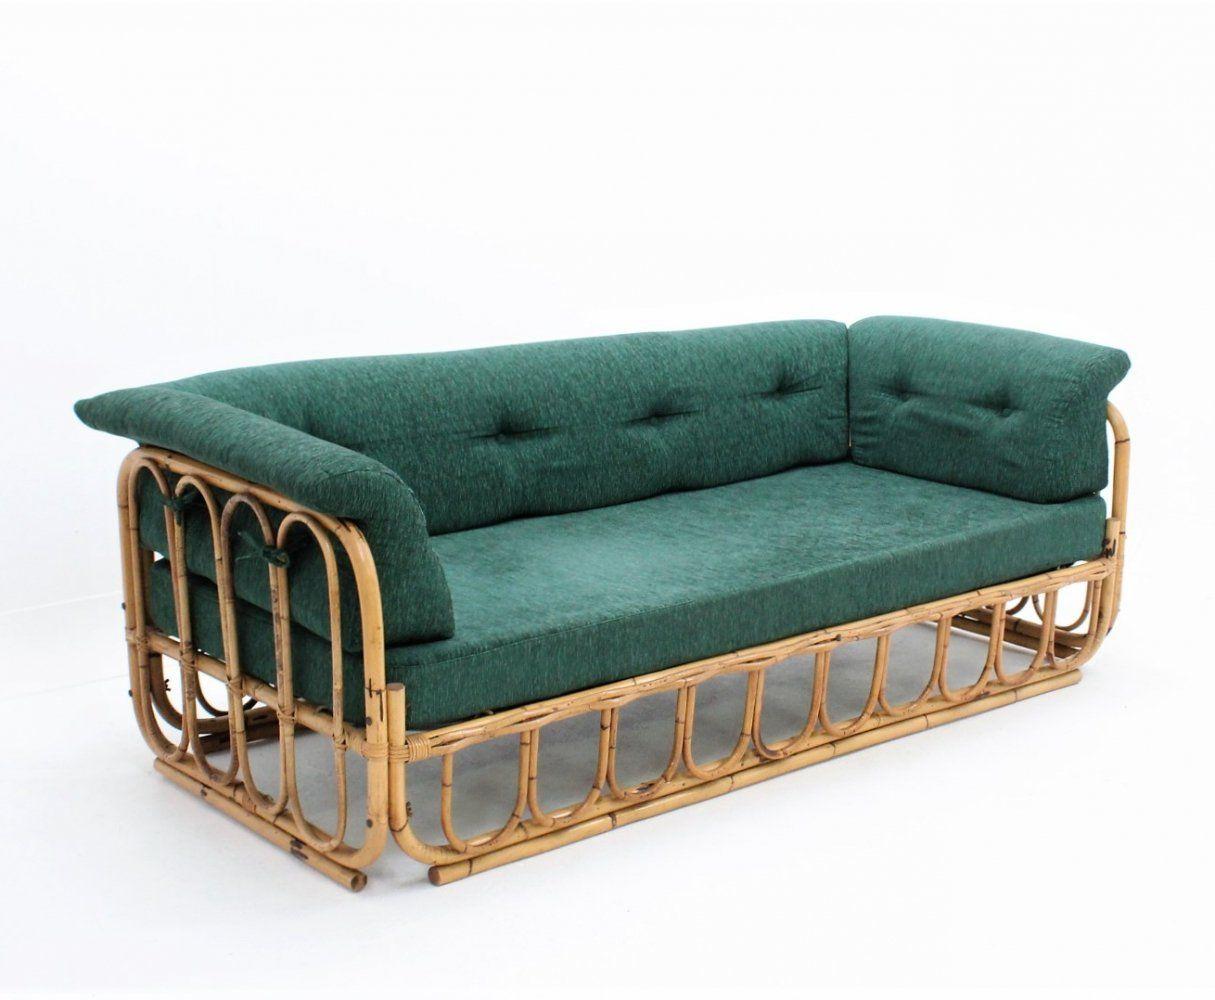 For sale Vintage rattan sofa / daybed by Bonacina, 1970s ...